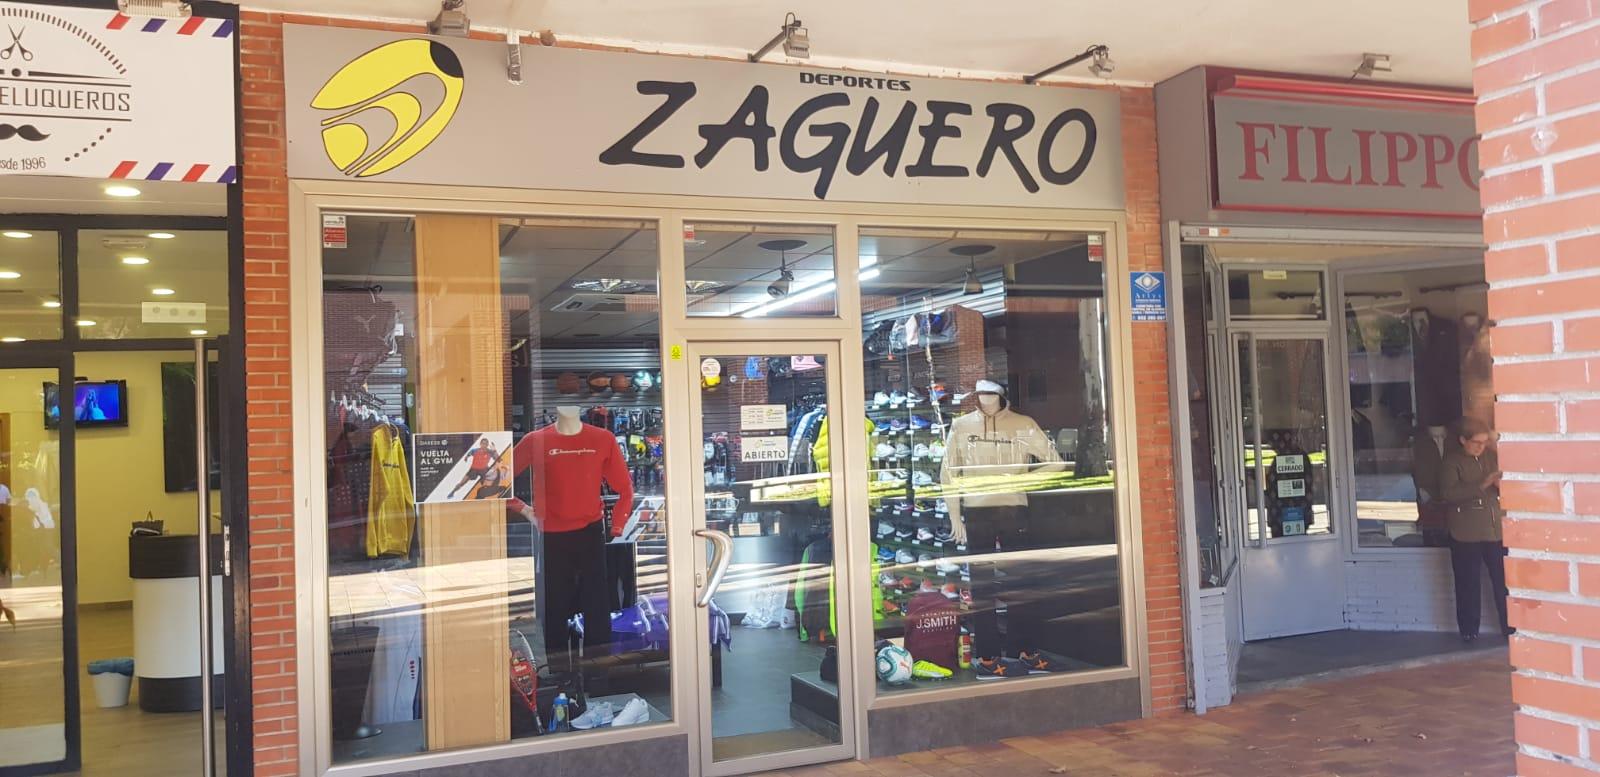 Deportes Zaguero